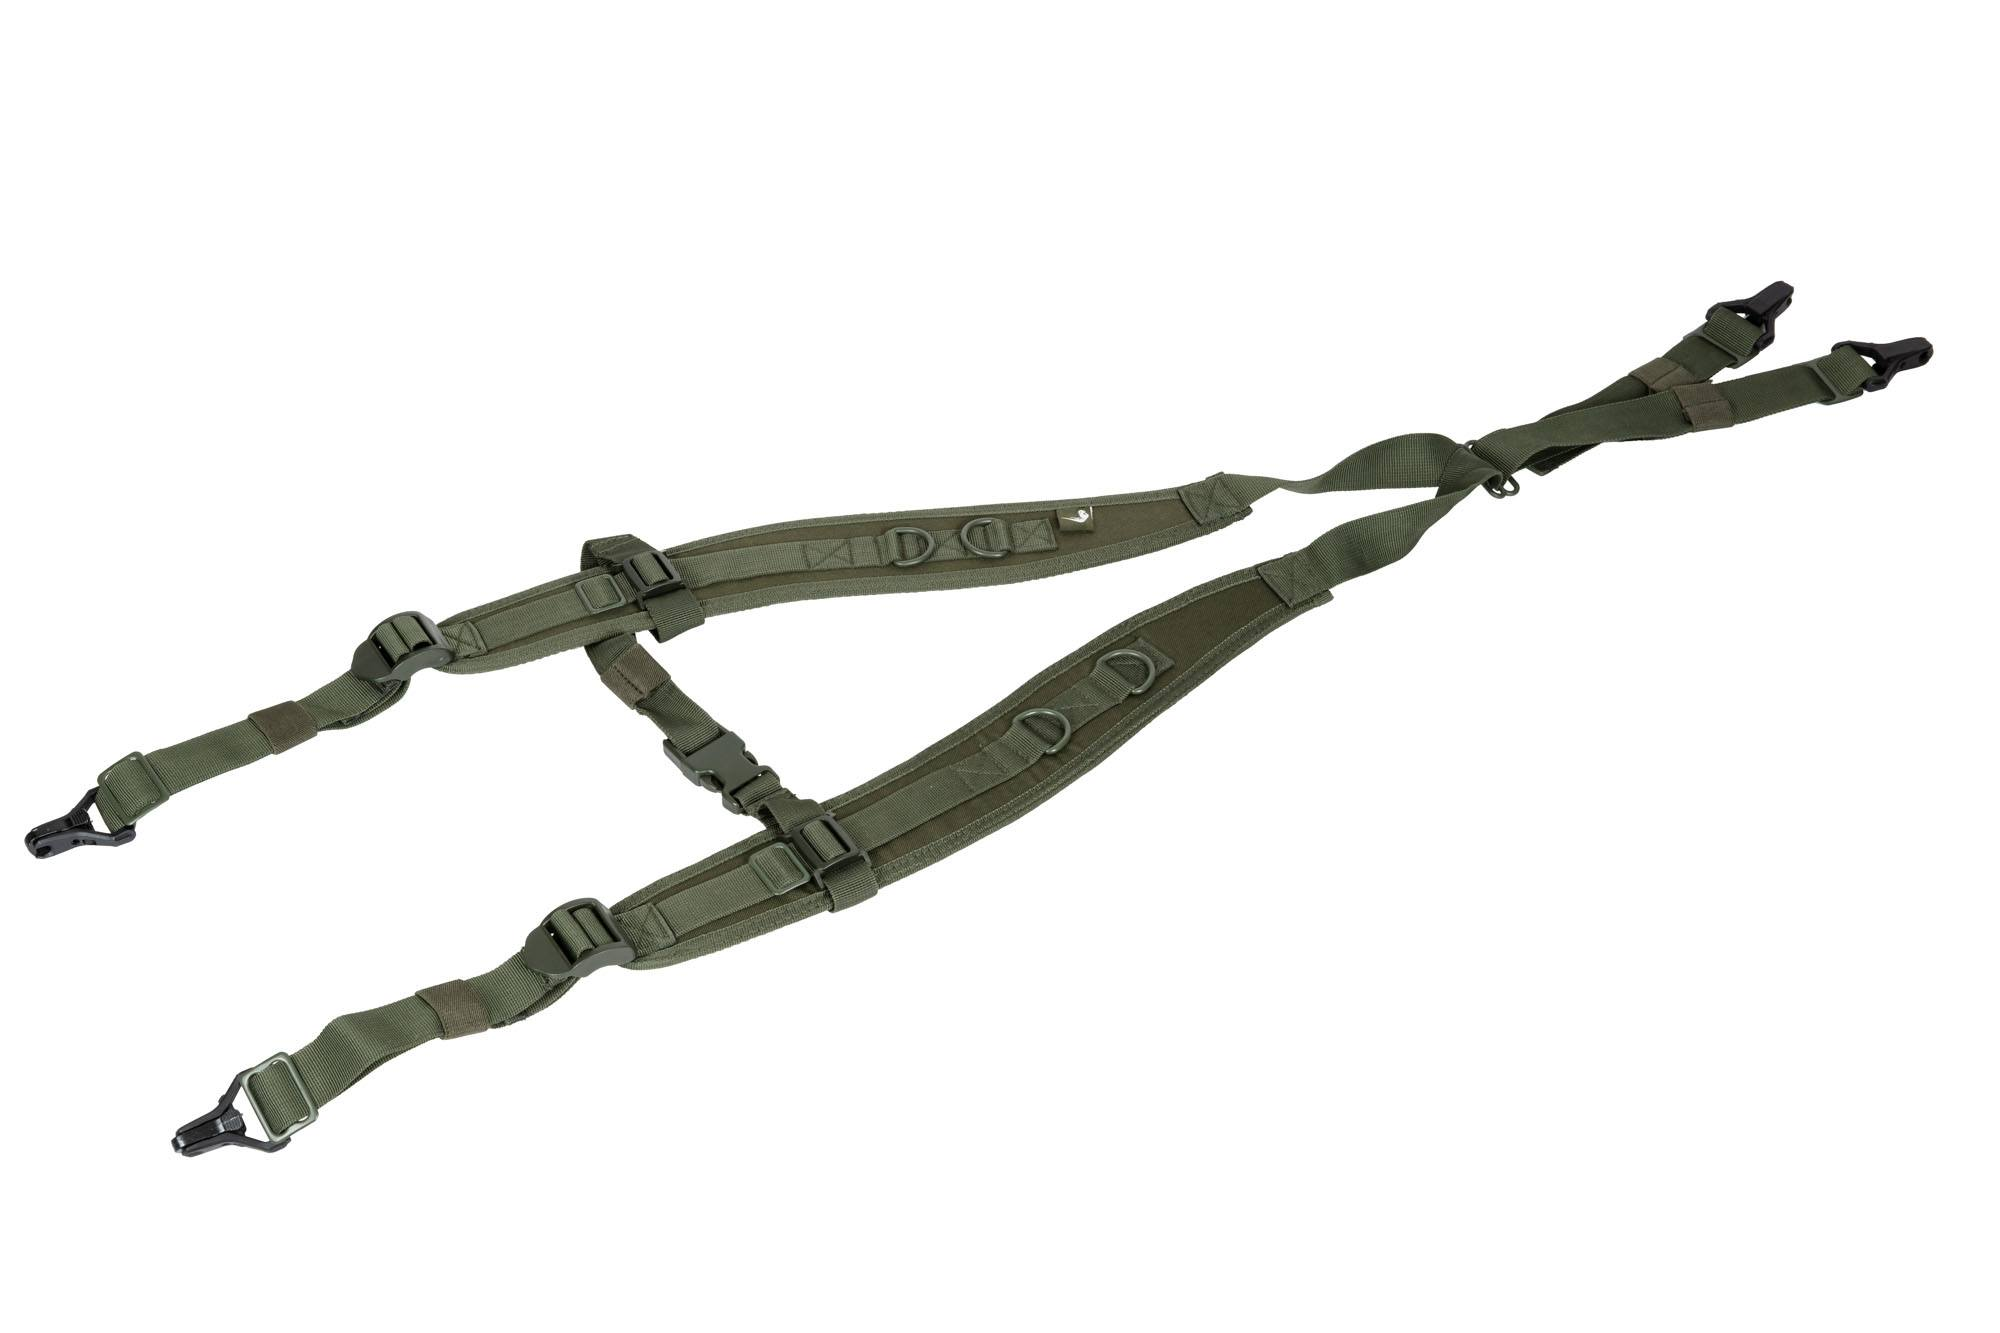 Viper 4-punkt LH harness - Olive